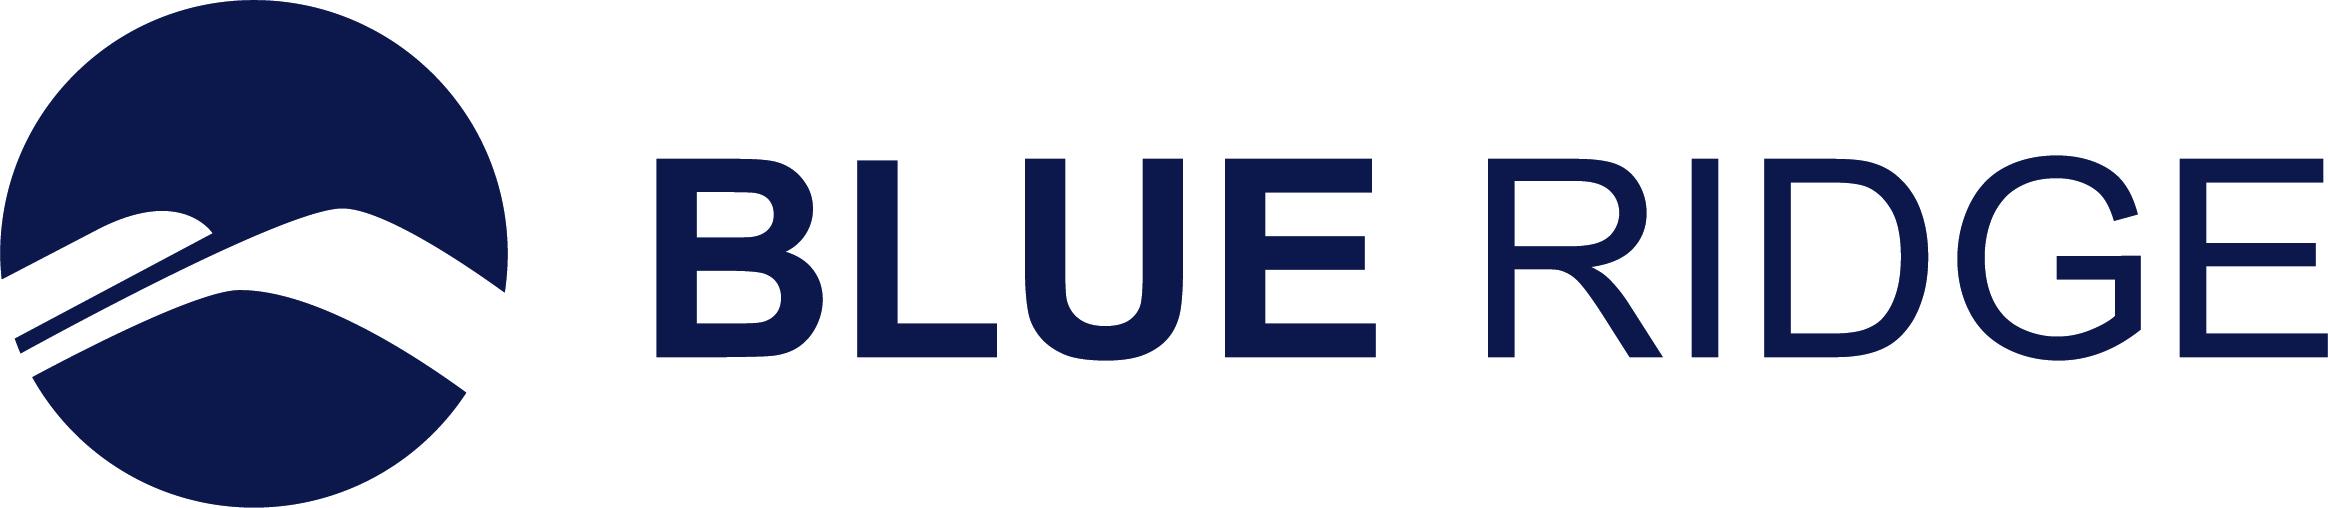 Registration Open Now for Blue Ridge BLUPRINT Virtual Conference